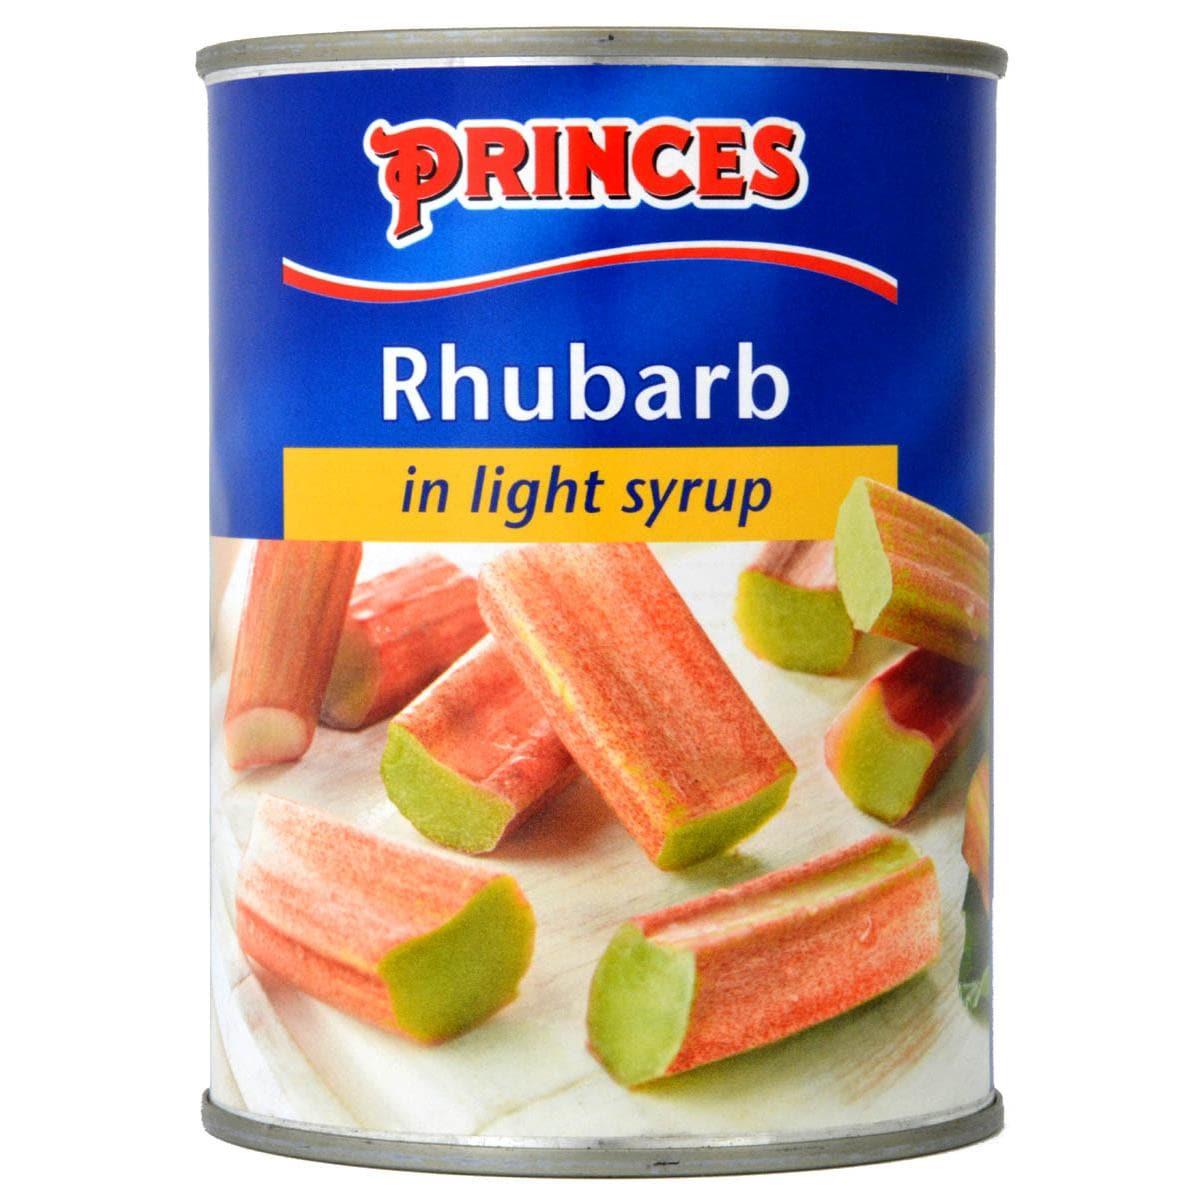 Princes Rhubarb in Light Syrup 540g - Rhabarber in Sirup